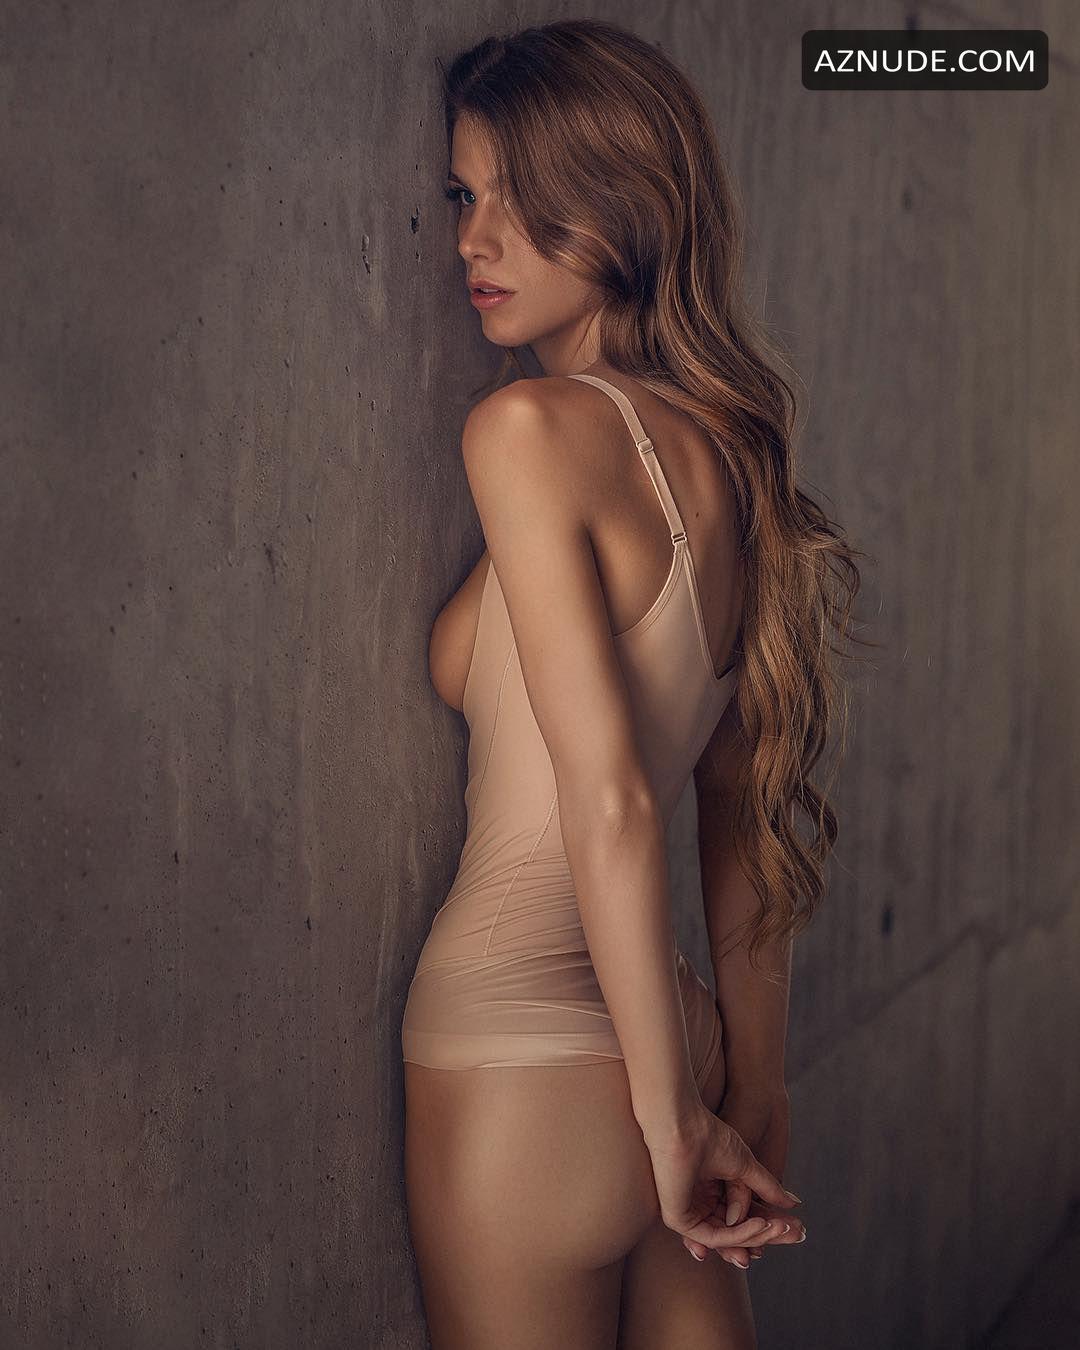 Angela Olszewska Nude In Sexy Photo Collection - Aznude-5731